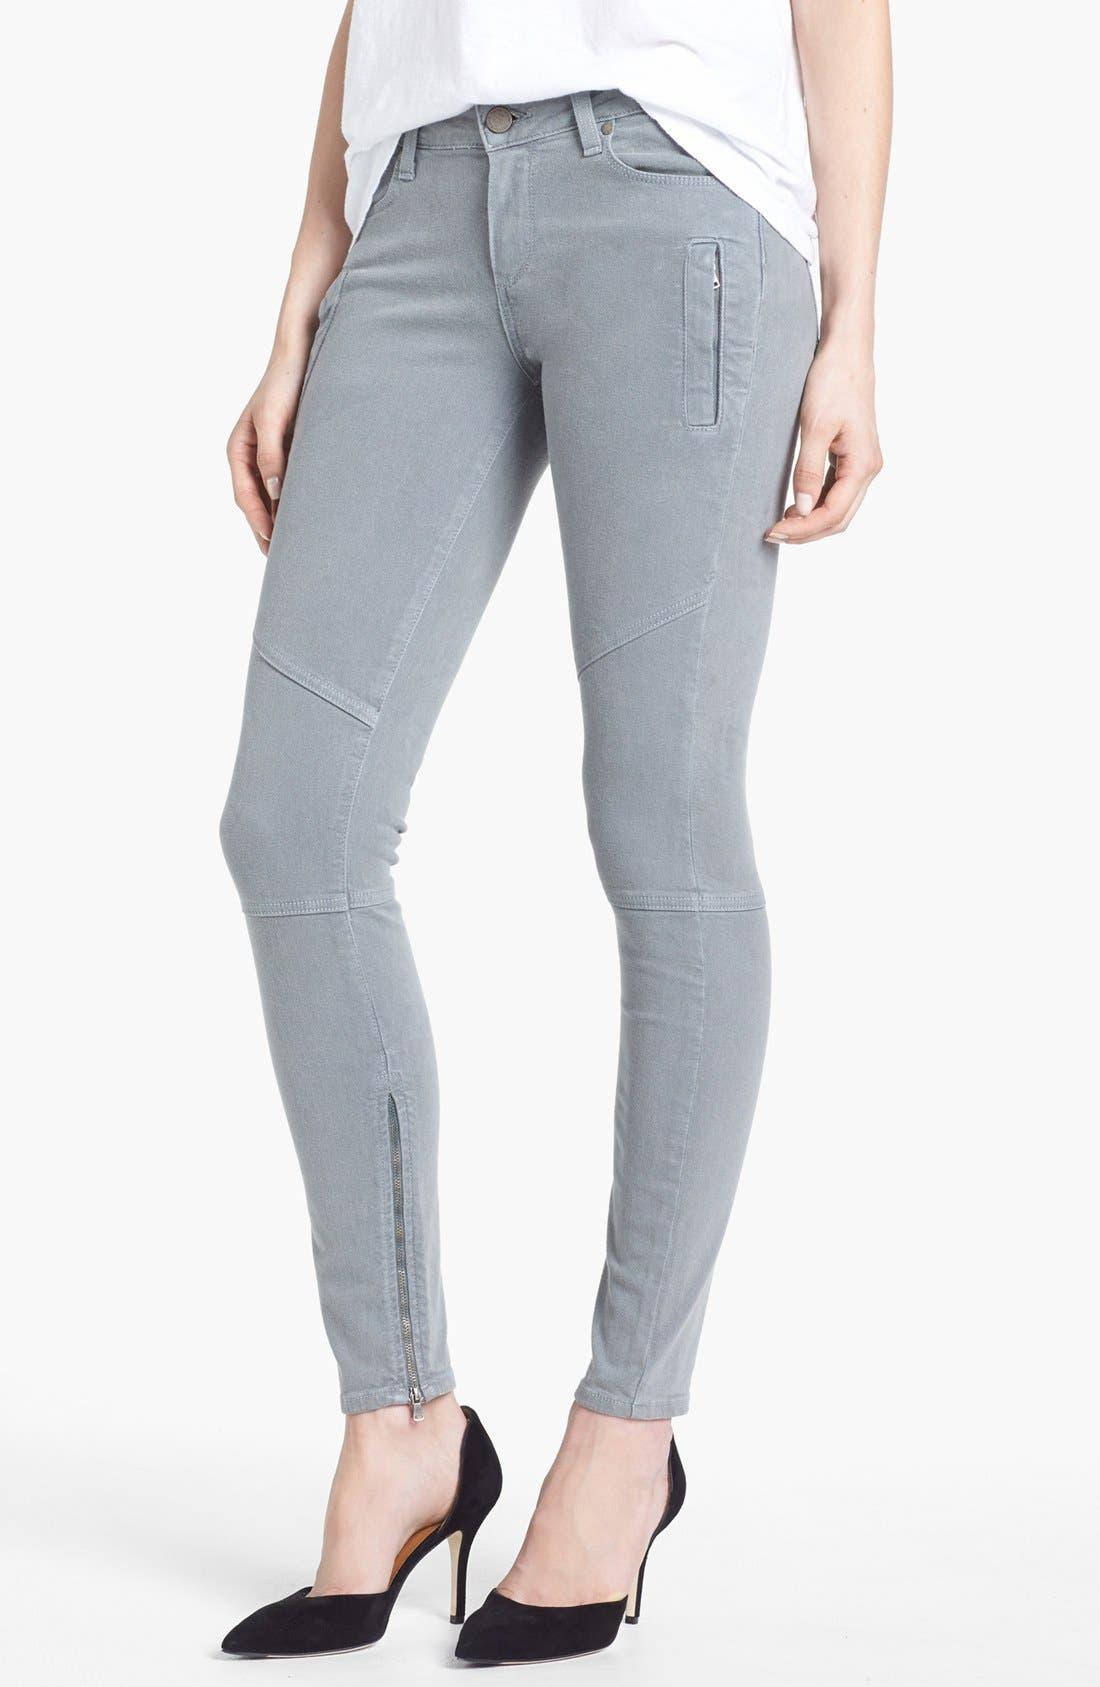 Alternate Image 1 Selected - Paige Denim 'Marley' Zip Detail Skinny Jeans (Cloud Cover)